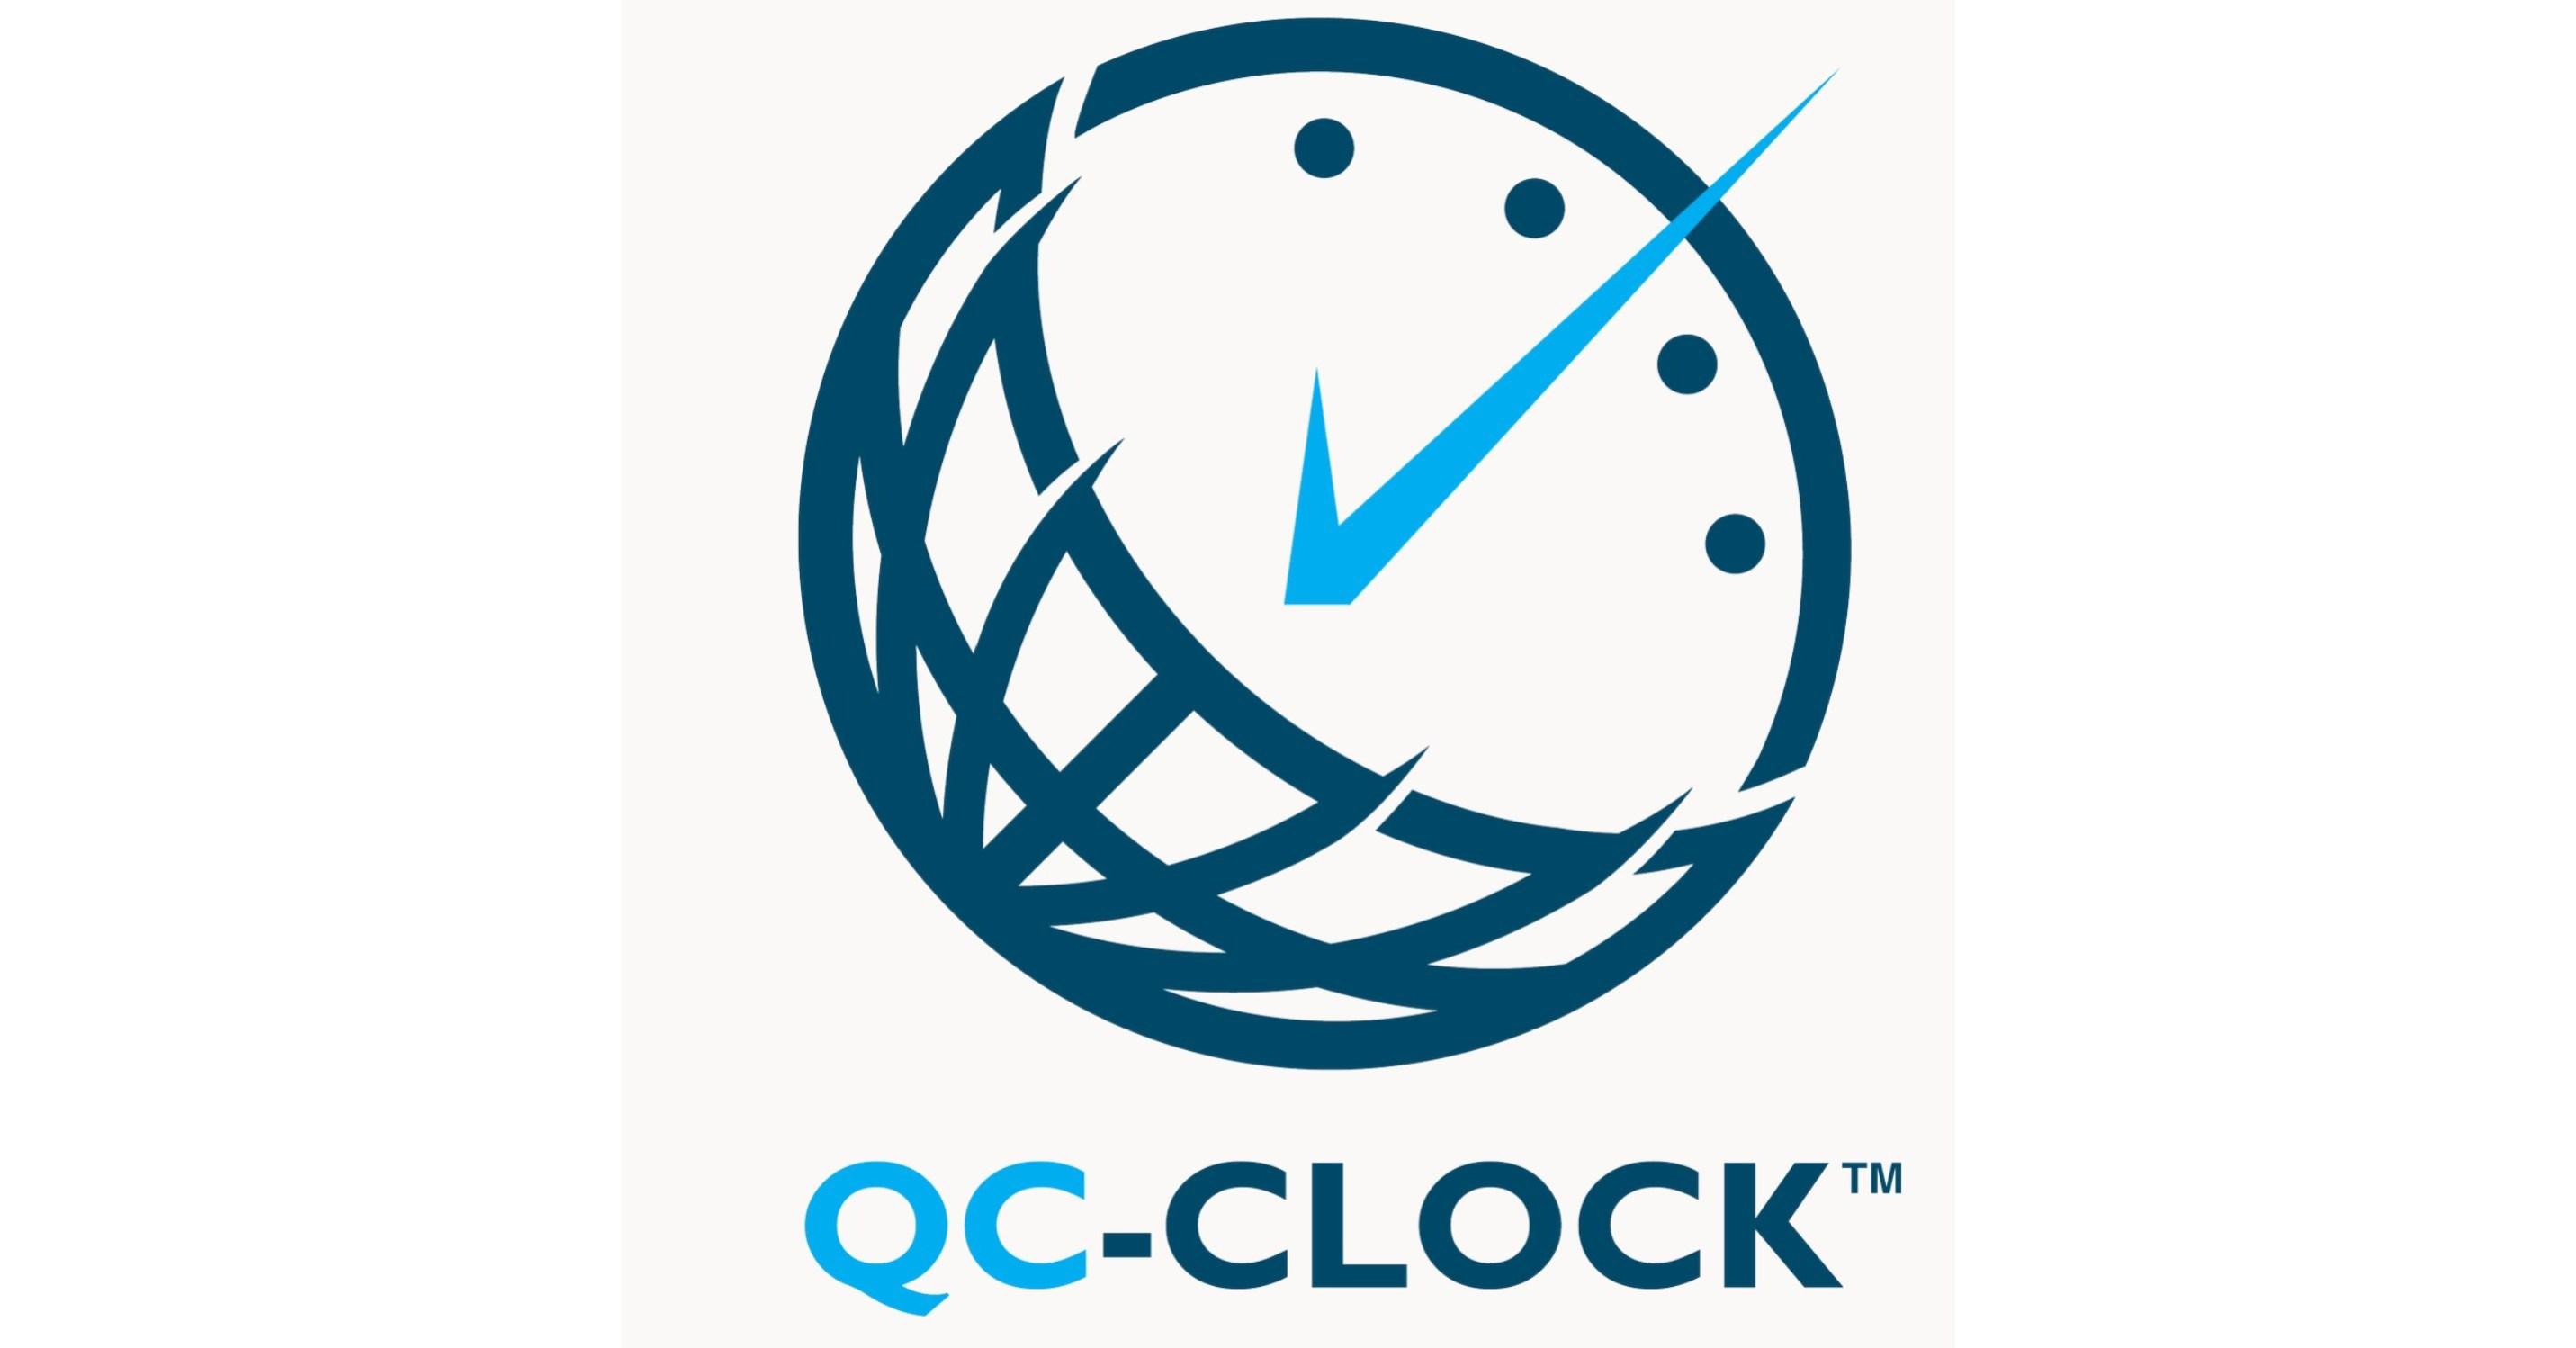 Calgary Tech Company Commercializes New Covid 19 Quarantine Compliance App